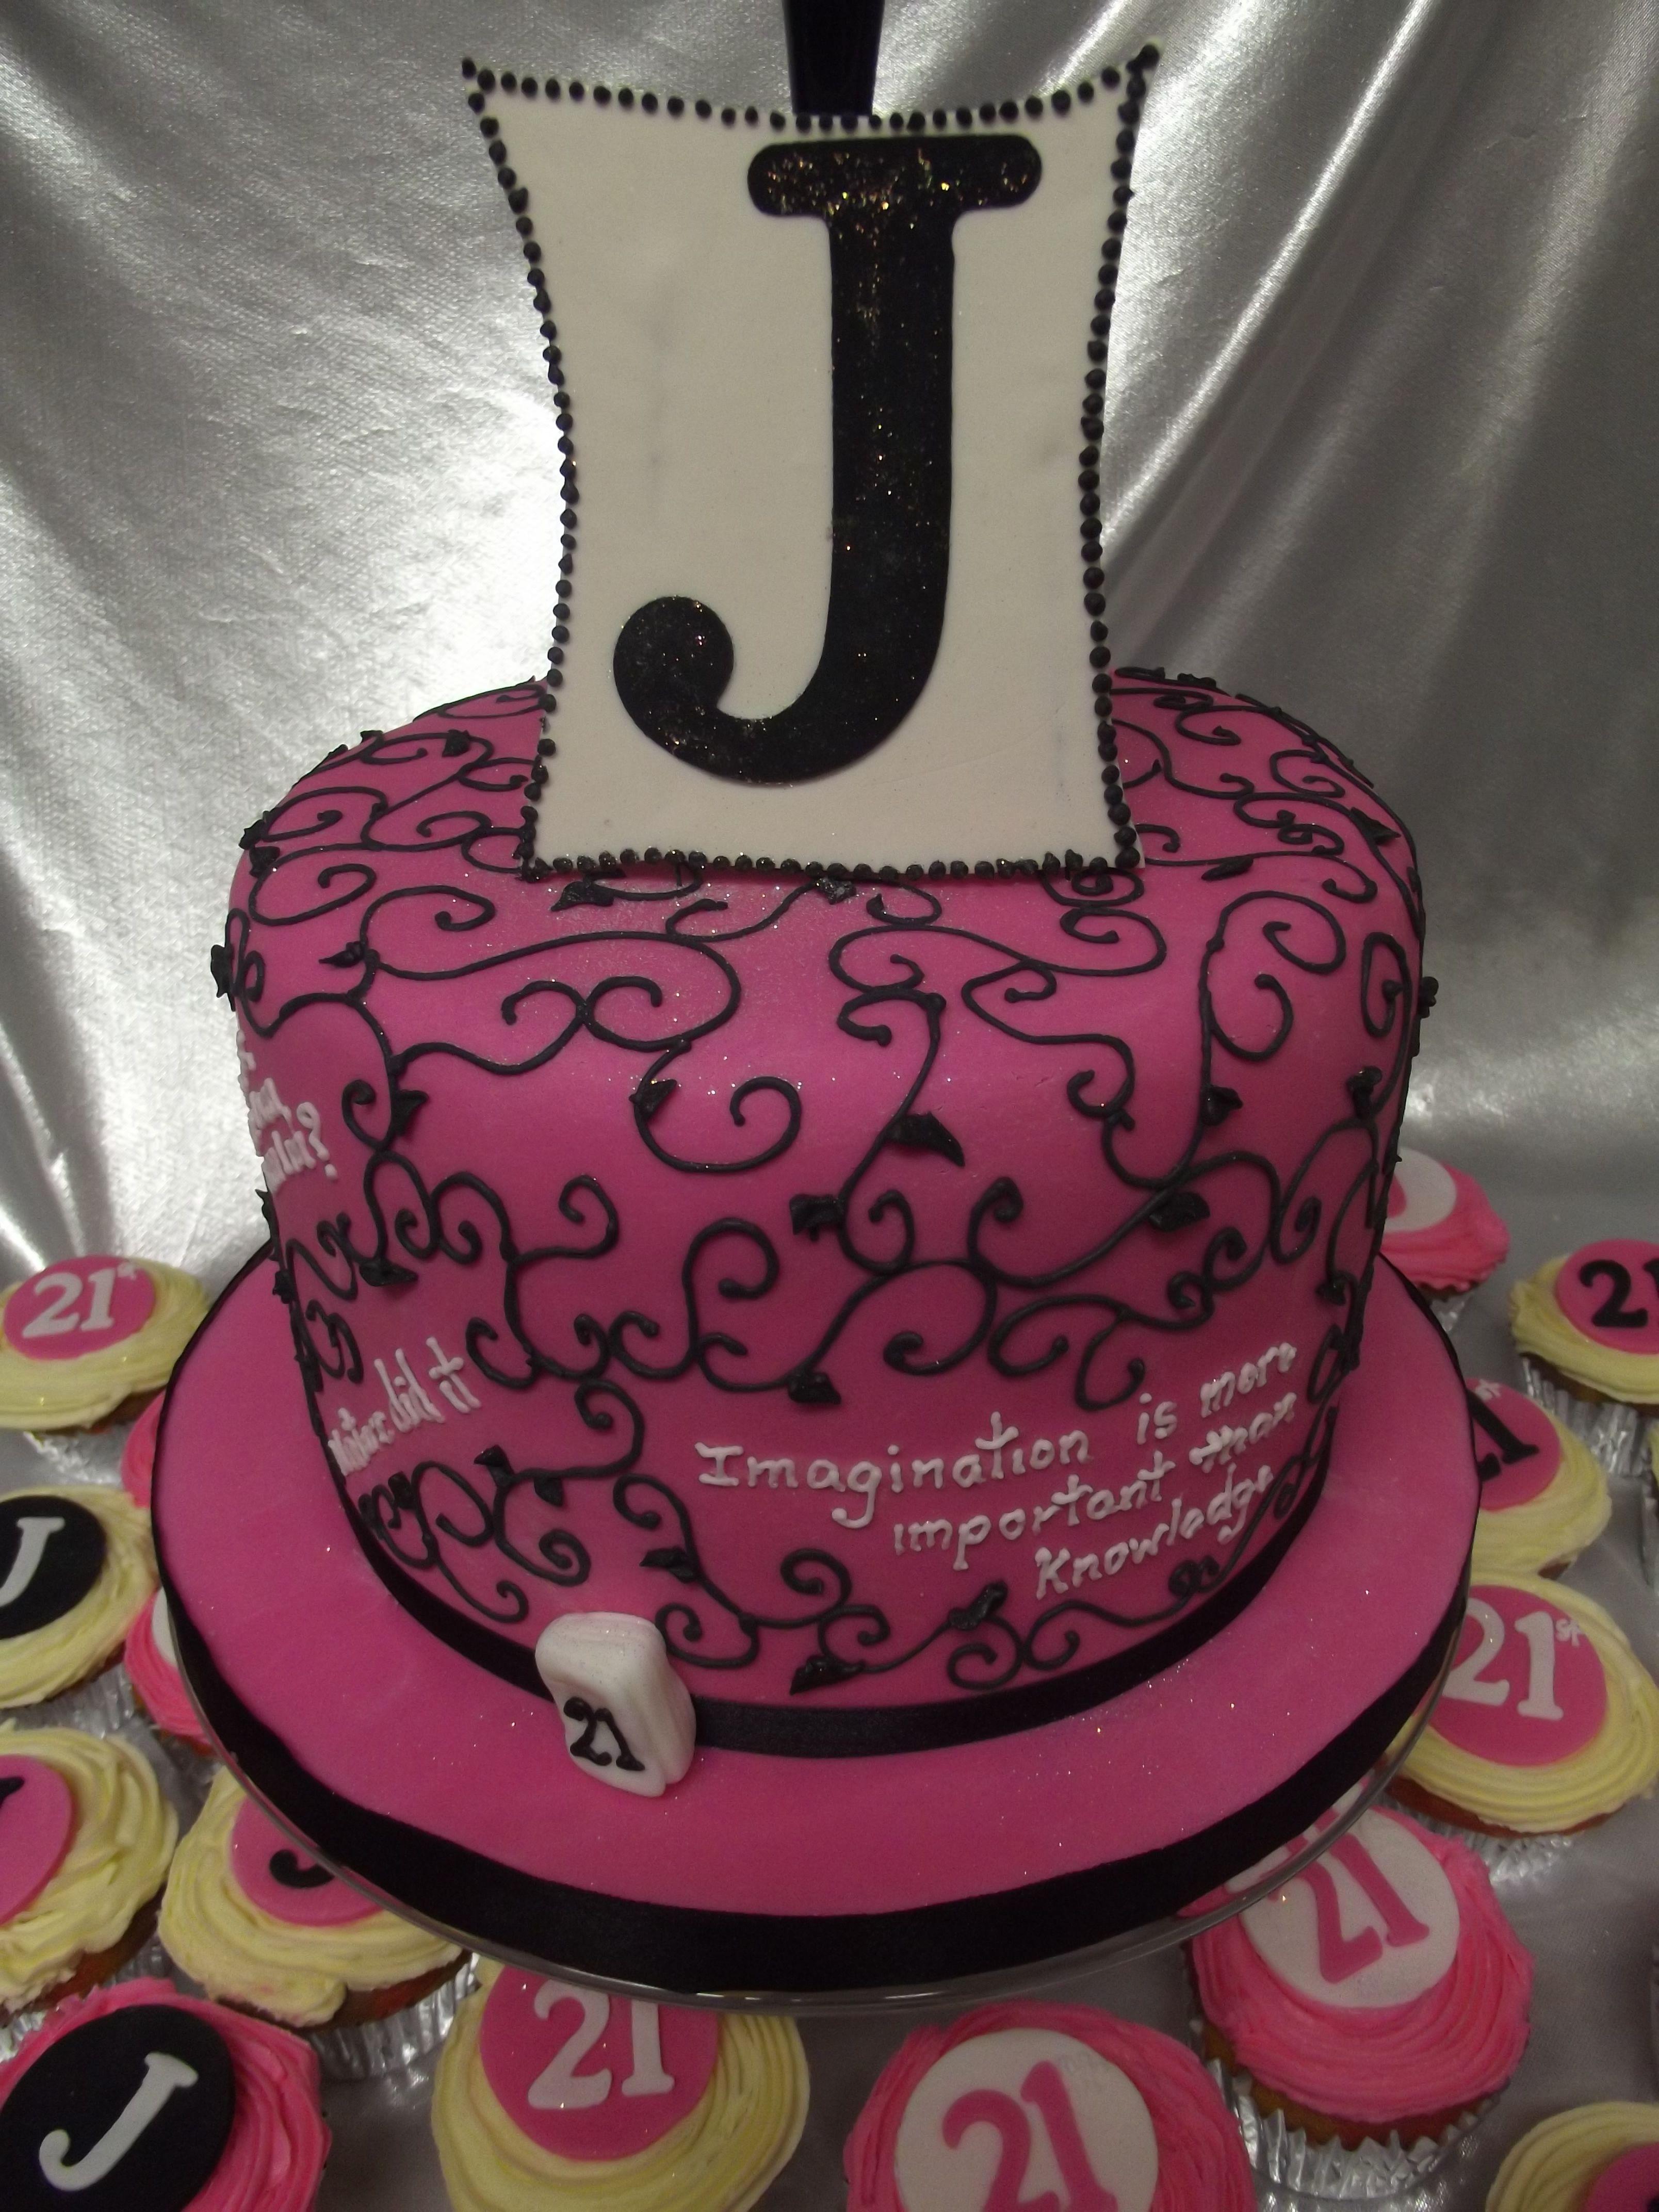 21st Swirl cornelia design cake 21st Birthday cake For a